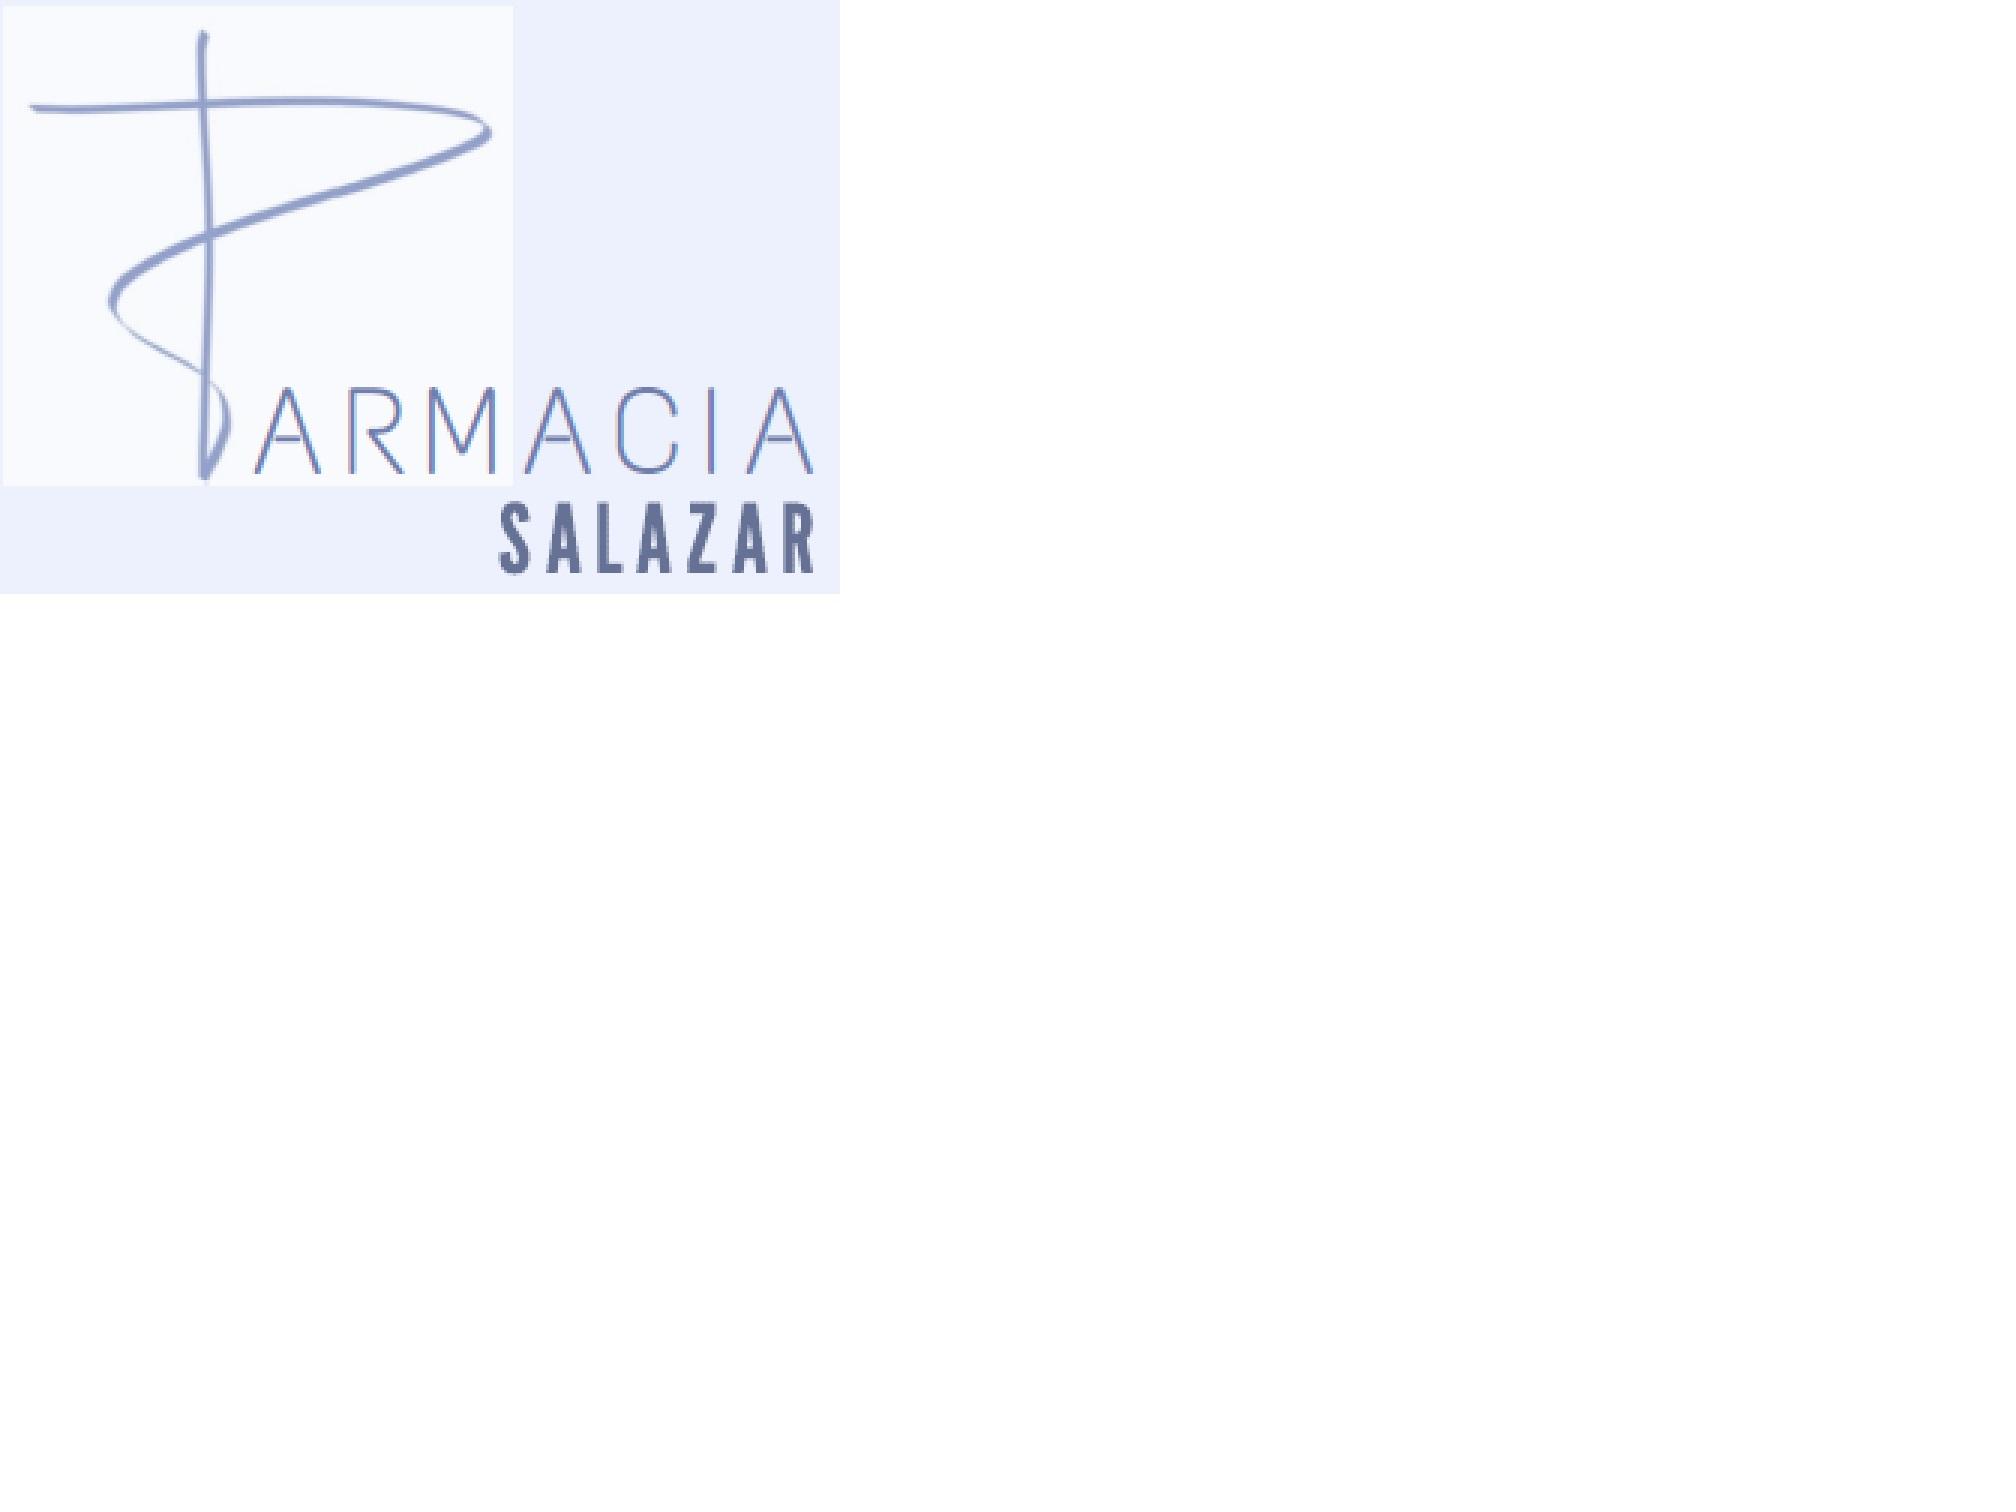 Farmacia Salazar